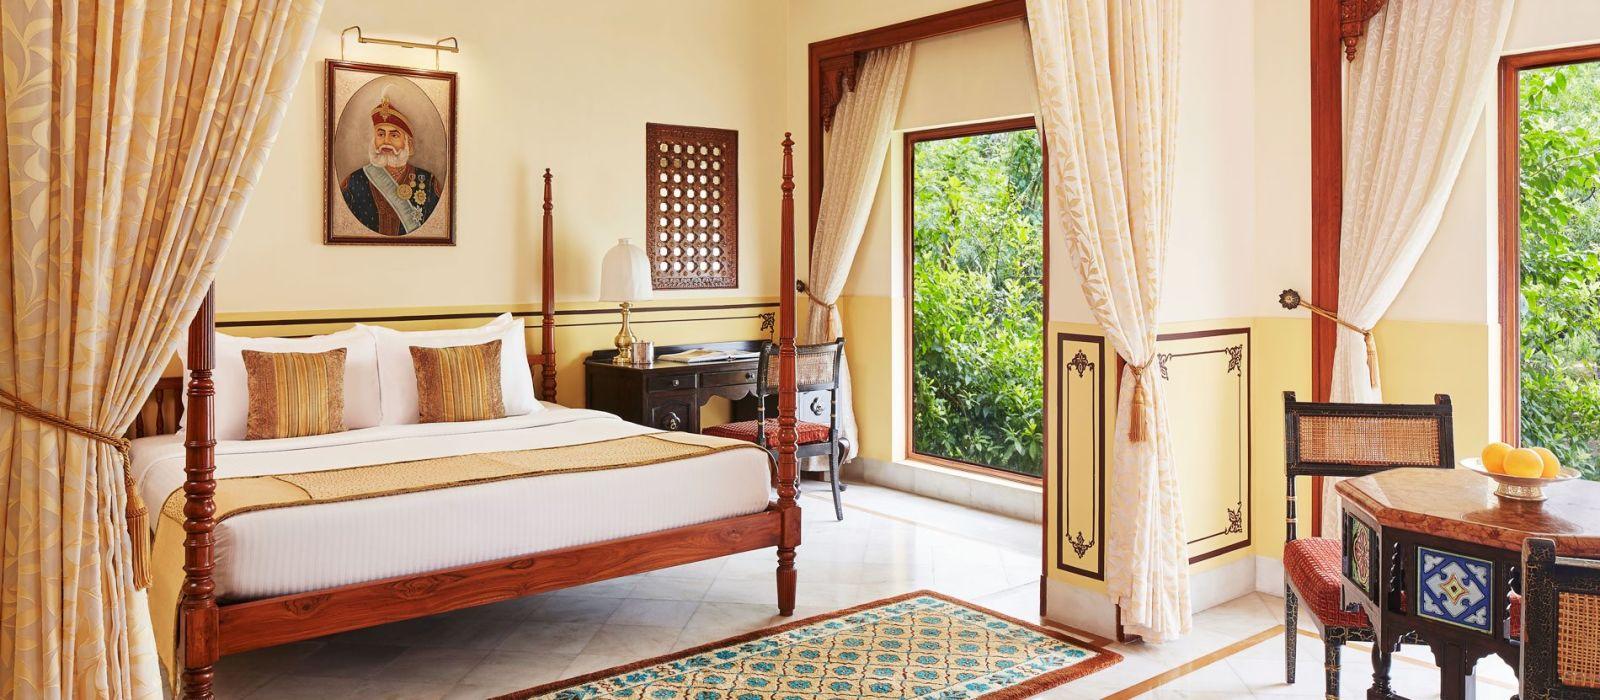 Hotel Taj Jai Mahal Palace North India